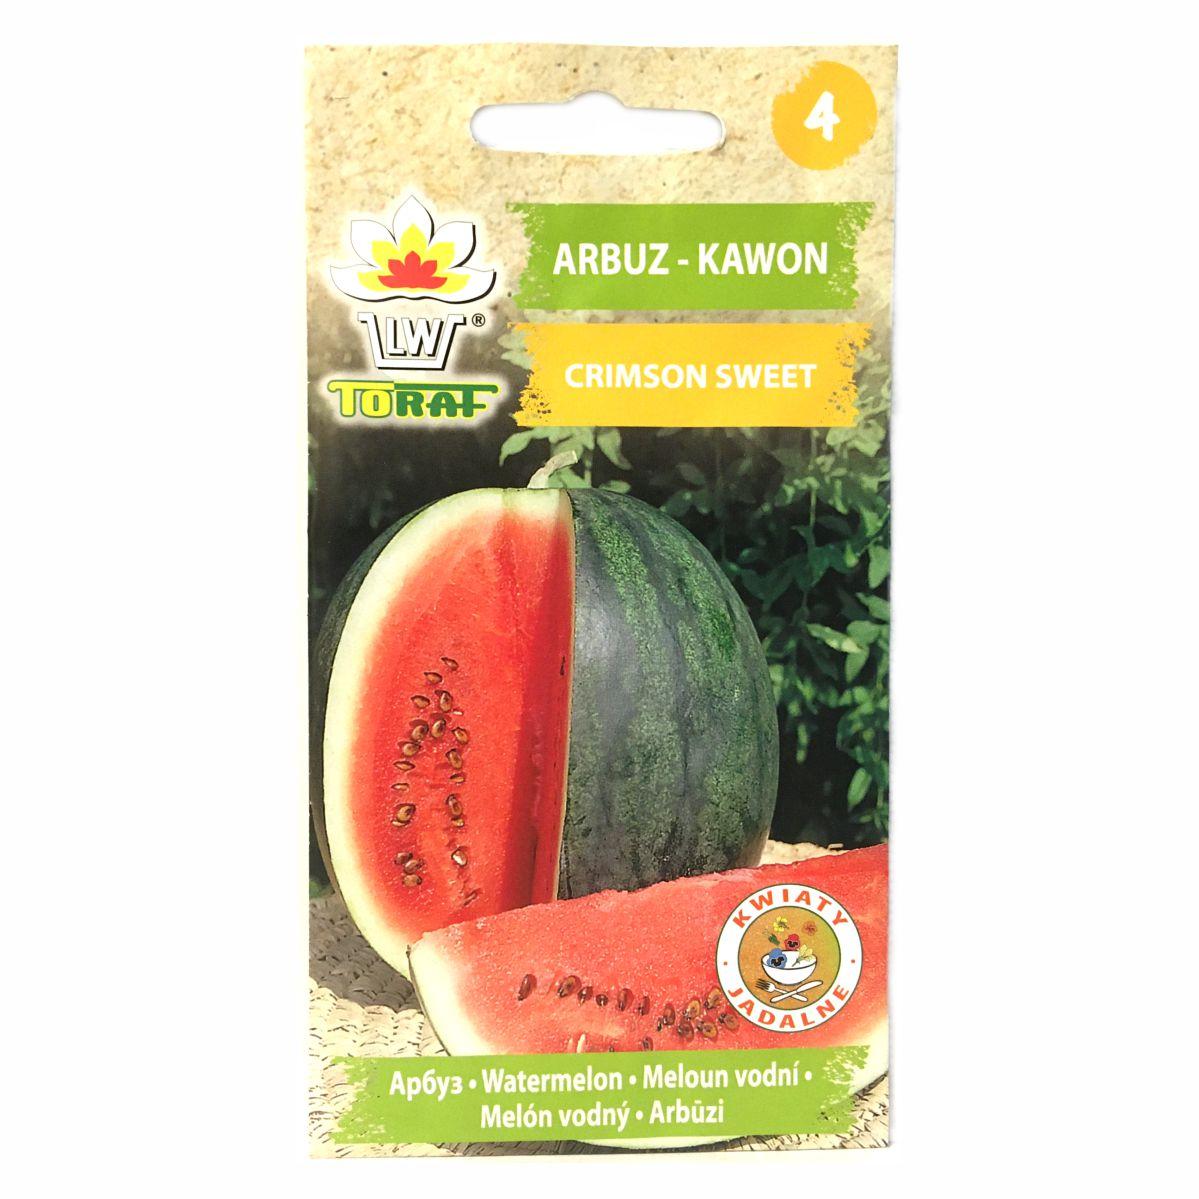 Arbuz kawon Crimson Sweet nasiona Toraf